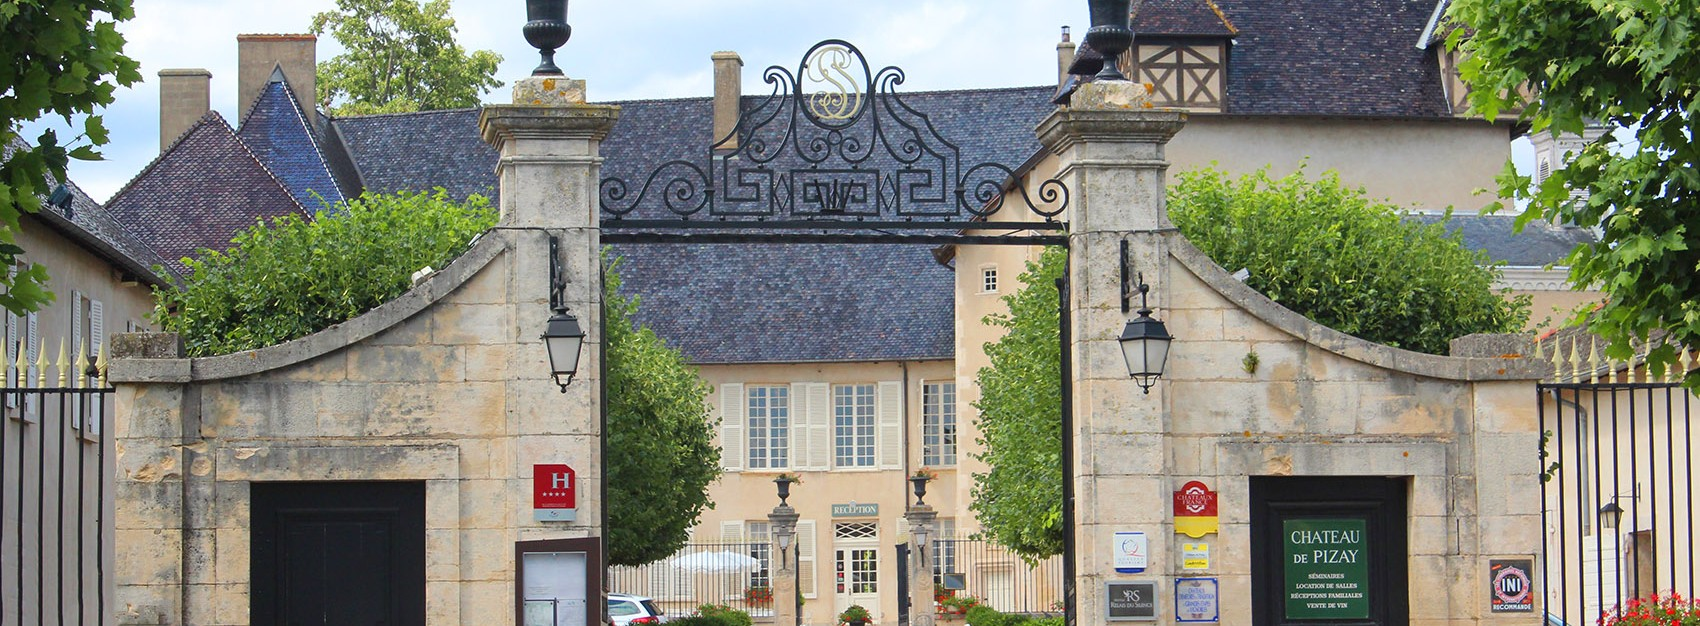 Chateau de pizay french wines - Chateau de pizay restaurant ...